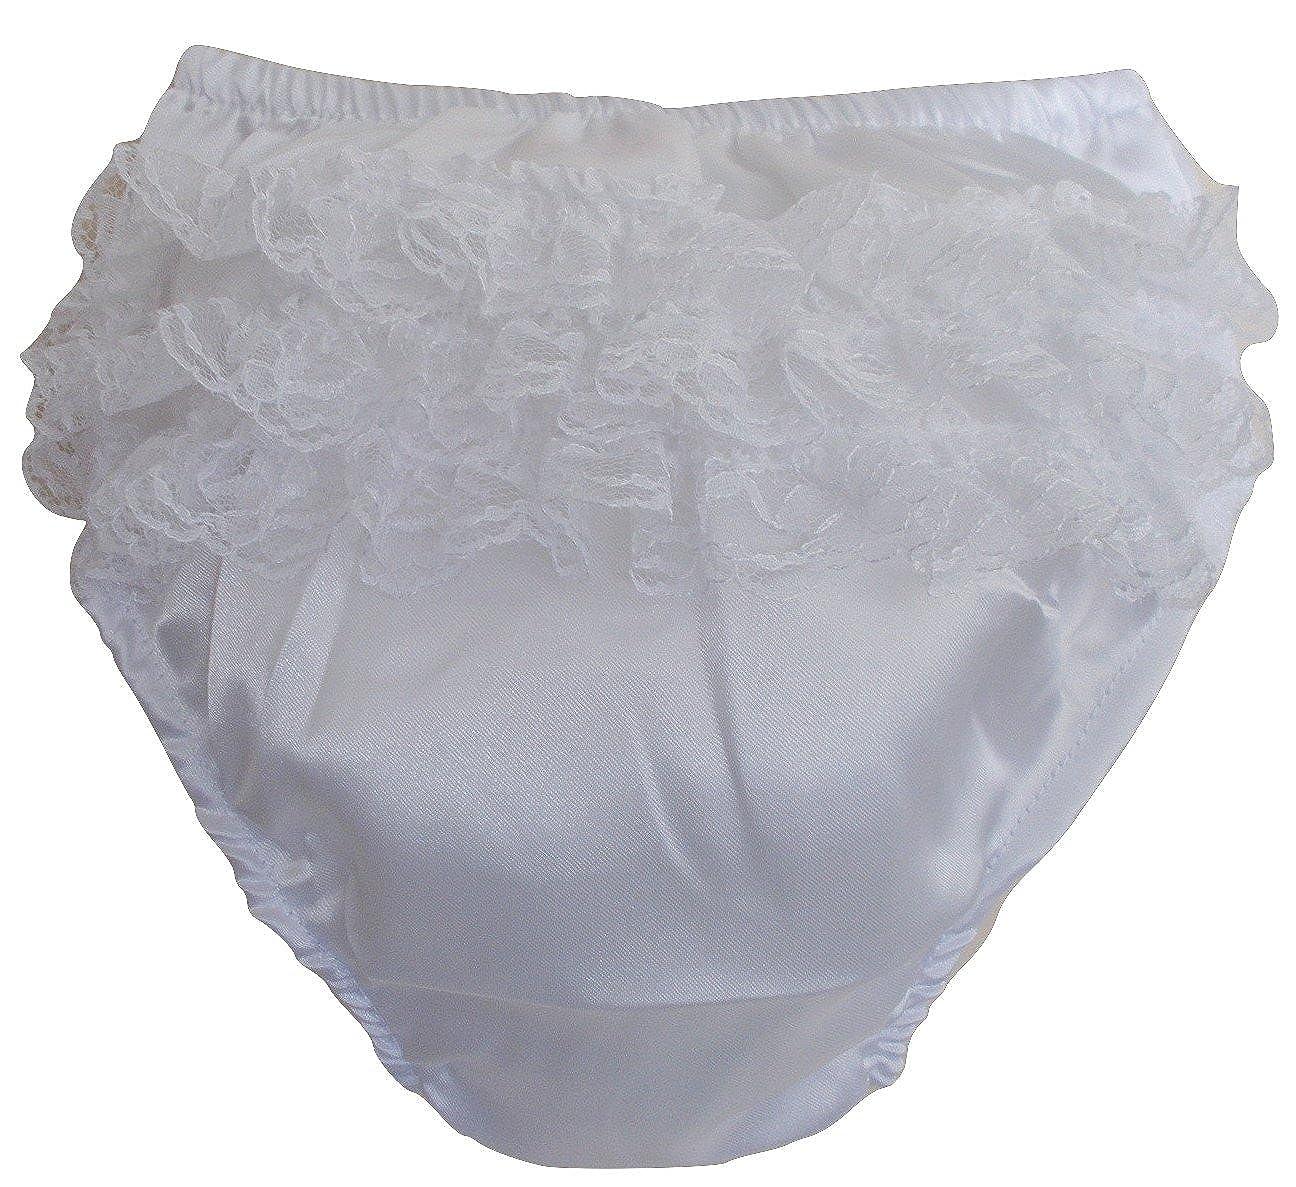 JIEYA 4-Pack Baby Girls Underwear Toddler Panties Bloomers Shorts-Assorted Color